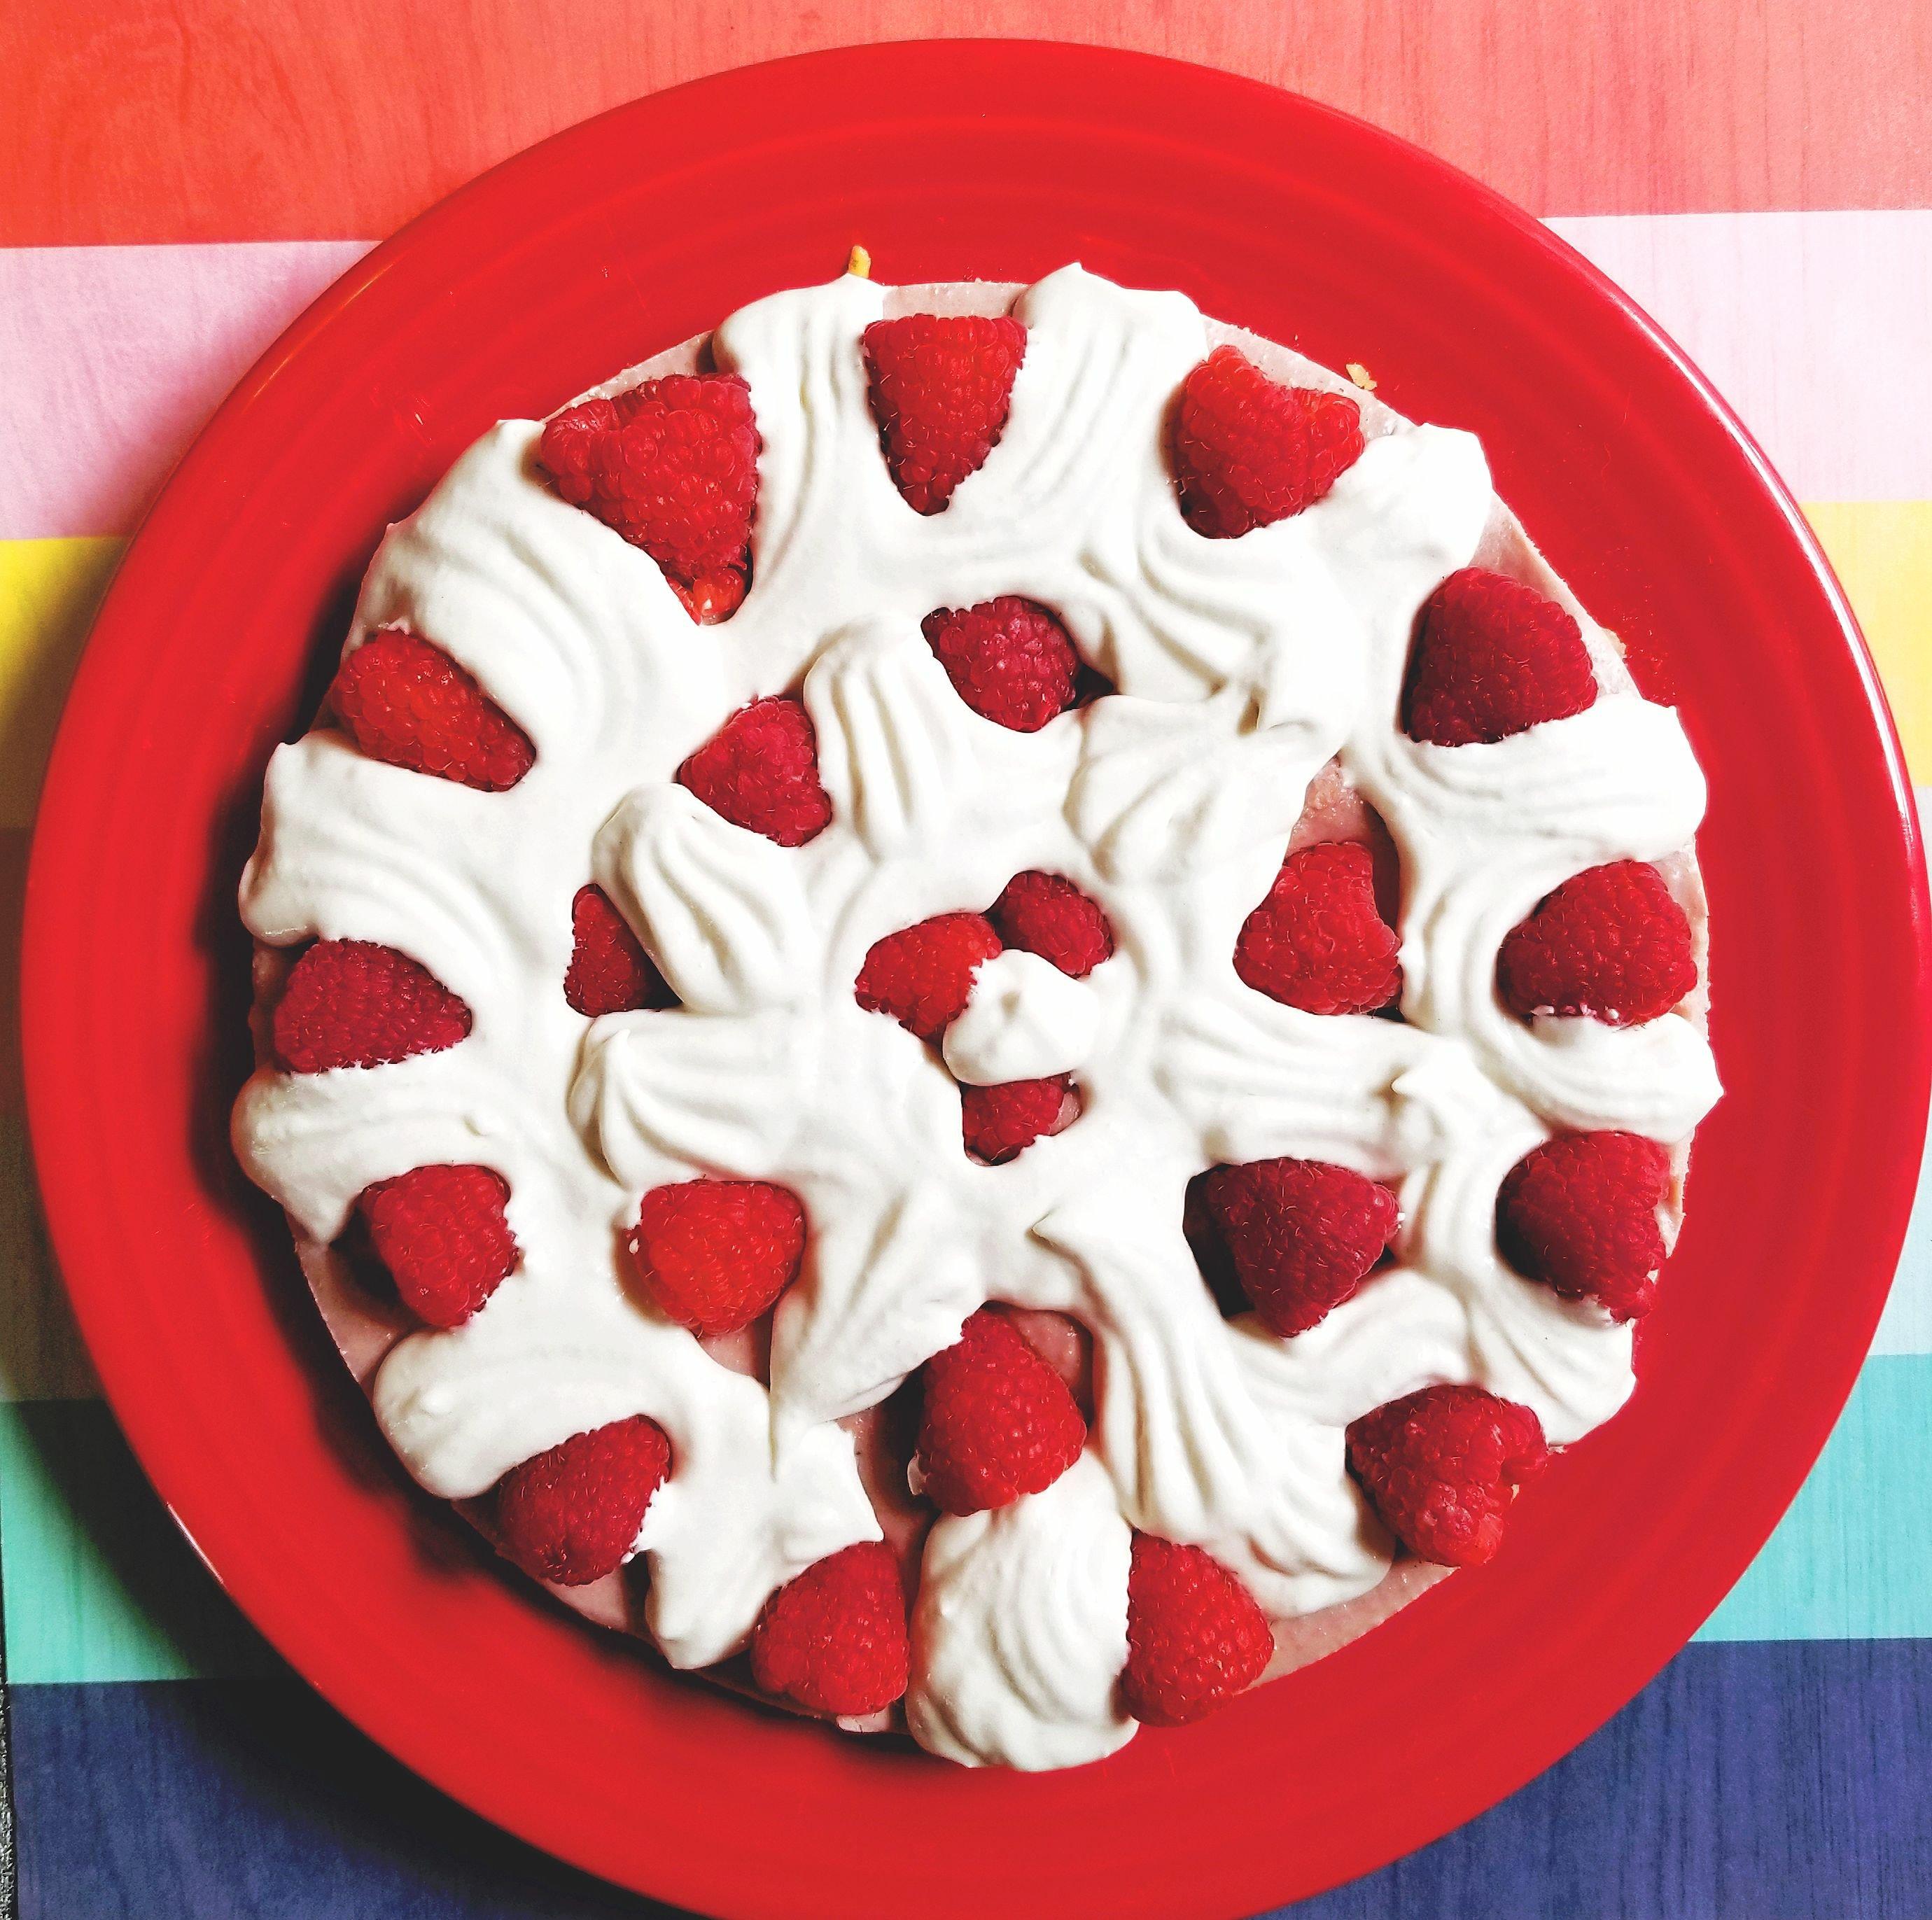 20180819 1332492002348075 - Paleo & Vegan No-Bake White Chocolate Raspberry Cheesecake - How I Made It